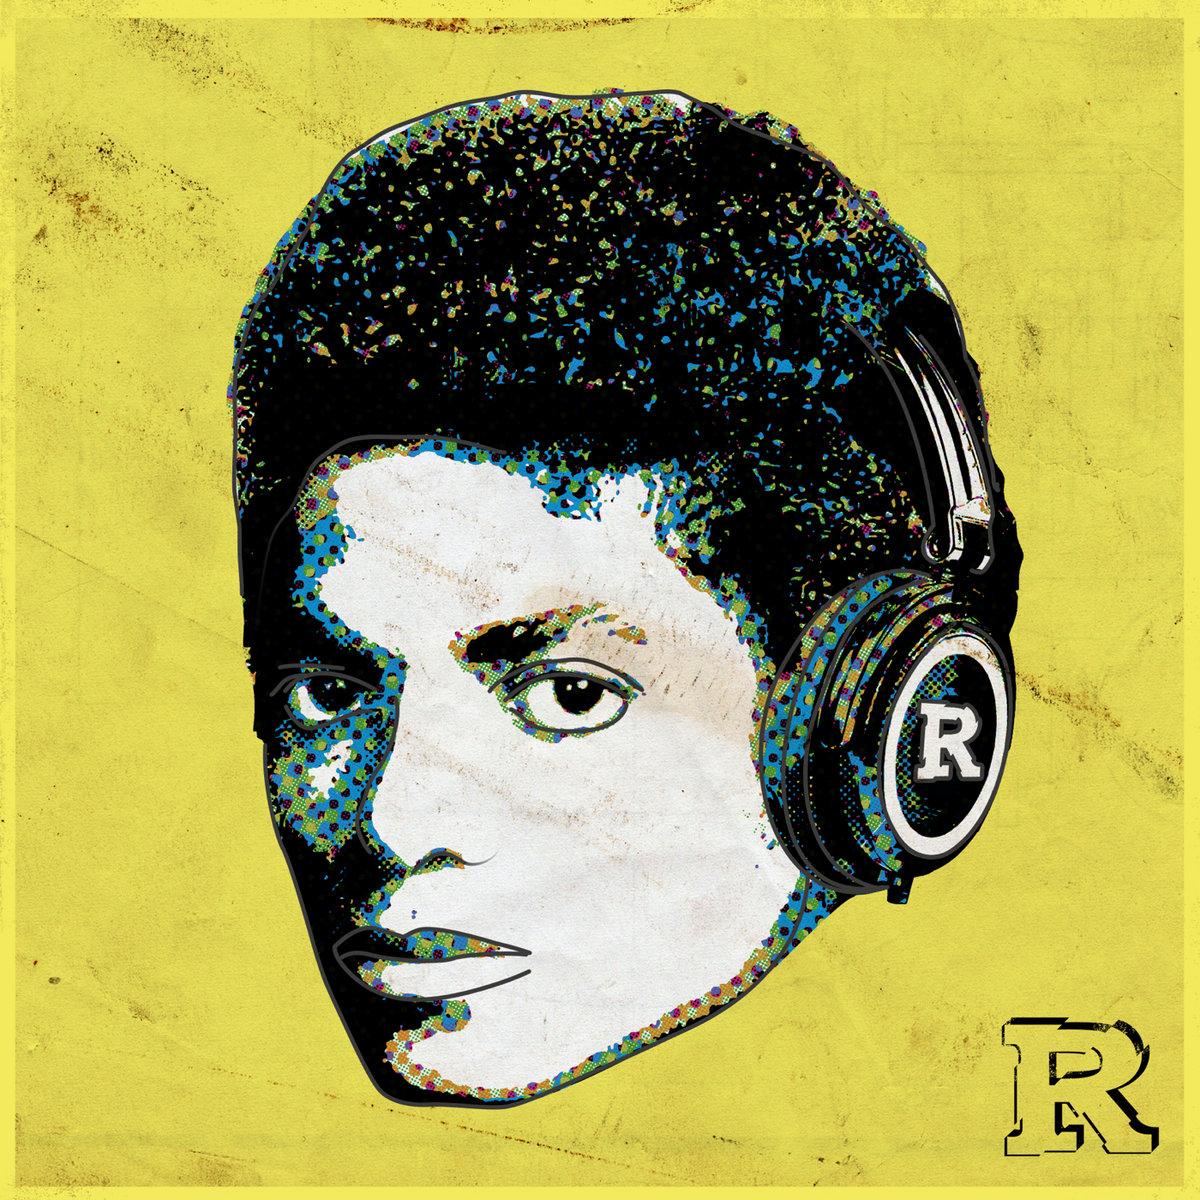 michael jackson thriller album mp3 download 320kbps